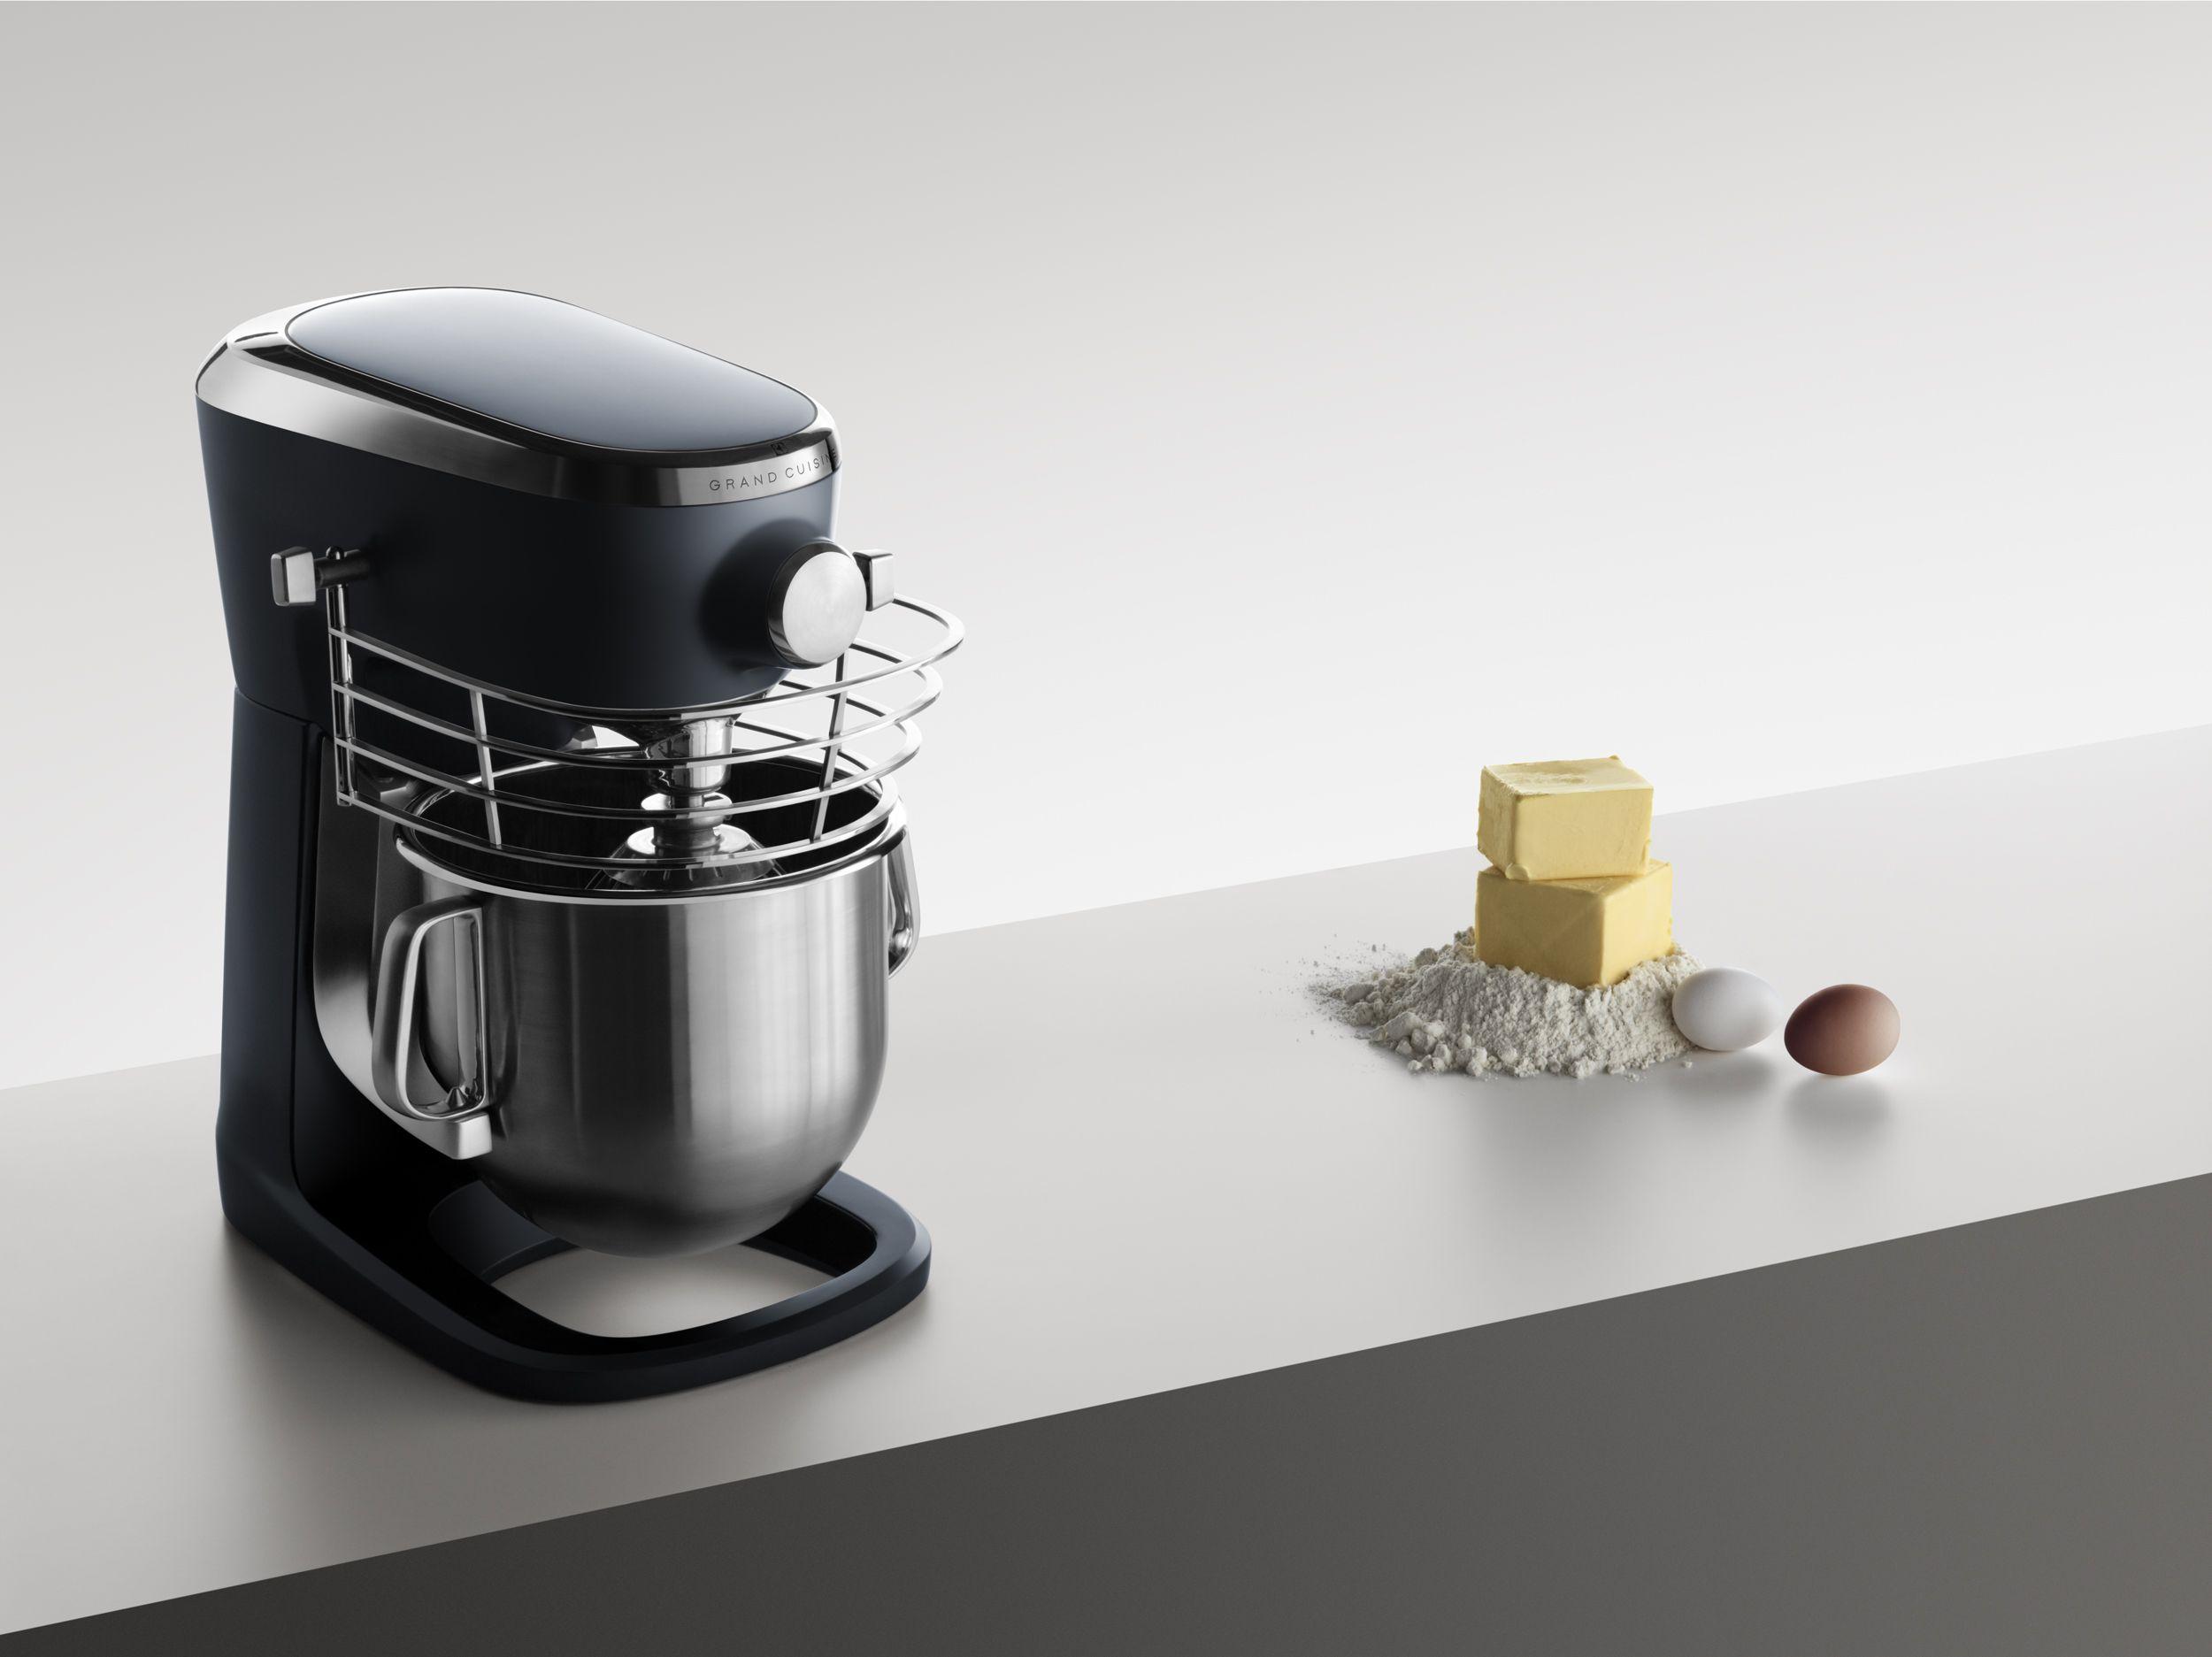 Pin by kaan şavk on built-in appliances | Pinterest